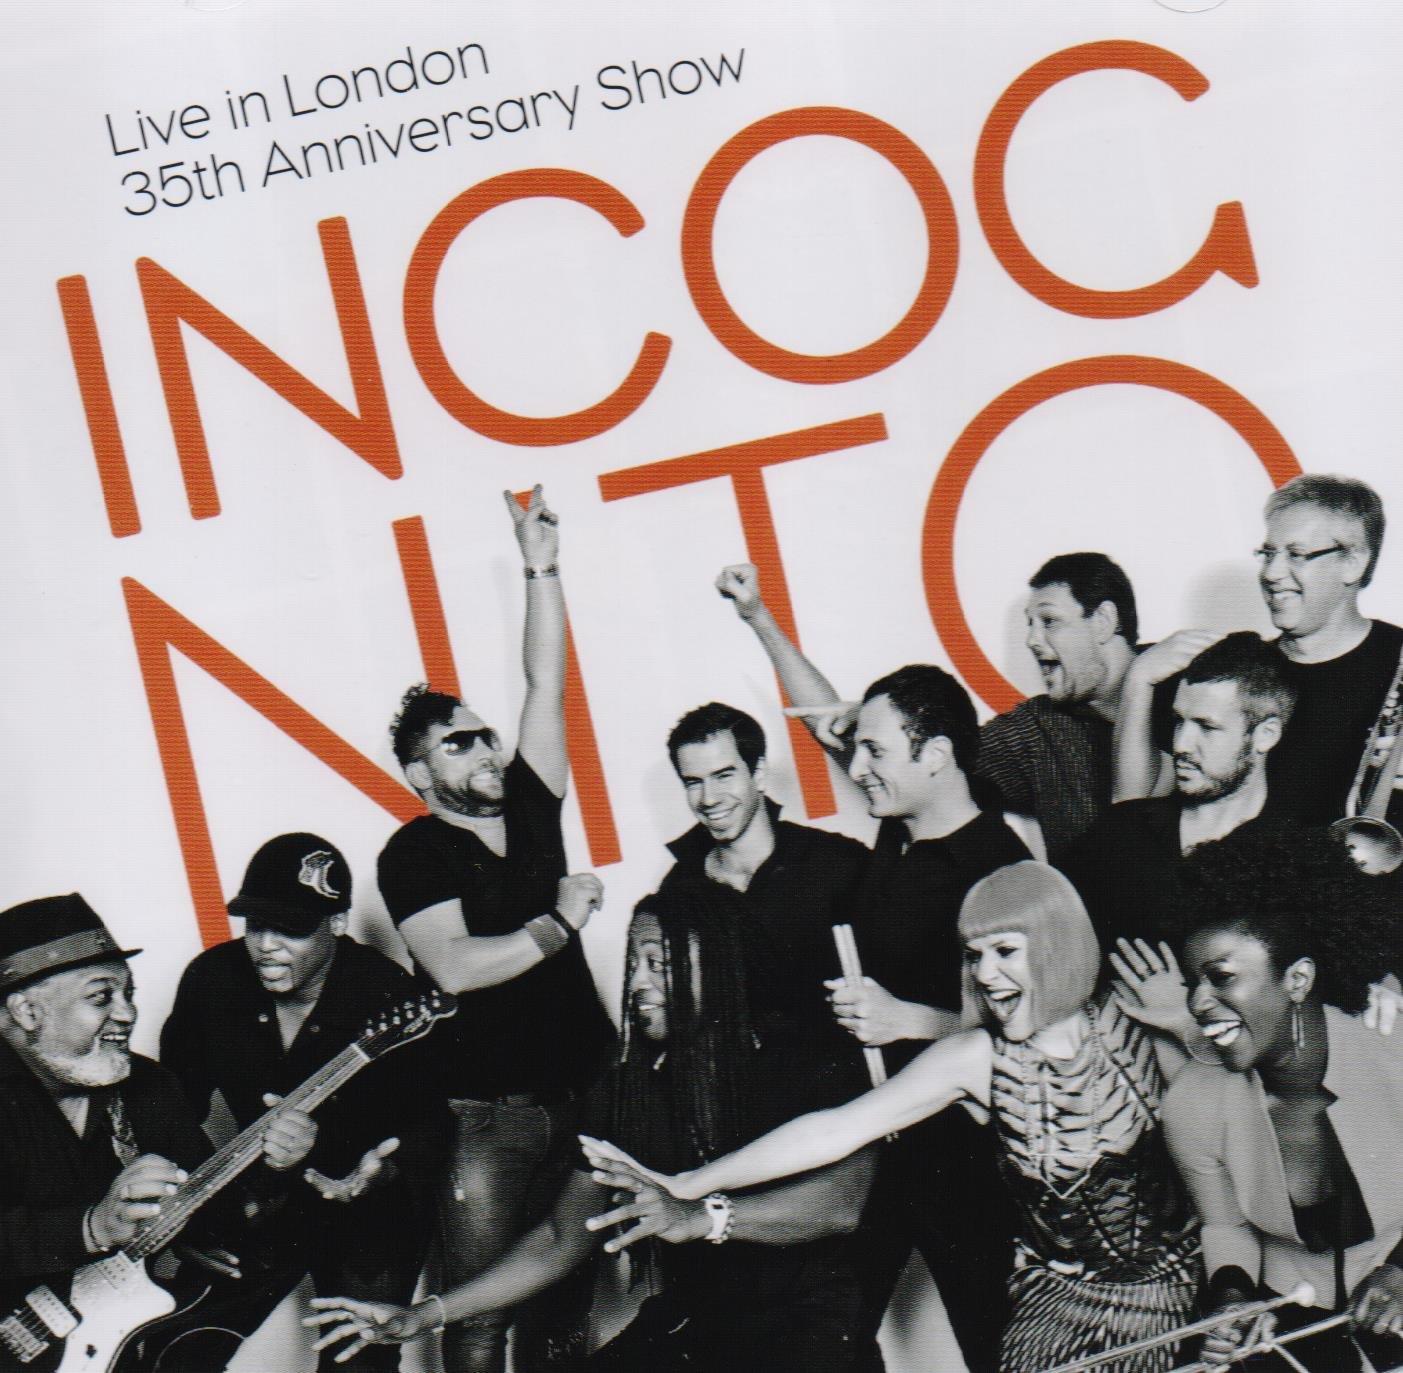 Live In London 35th Anniversary: Incognito: Amazon.es: CDs y vinilos}